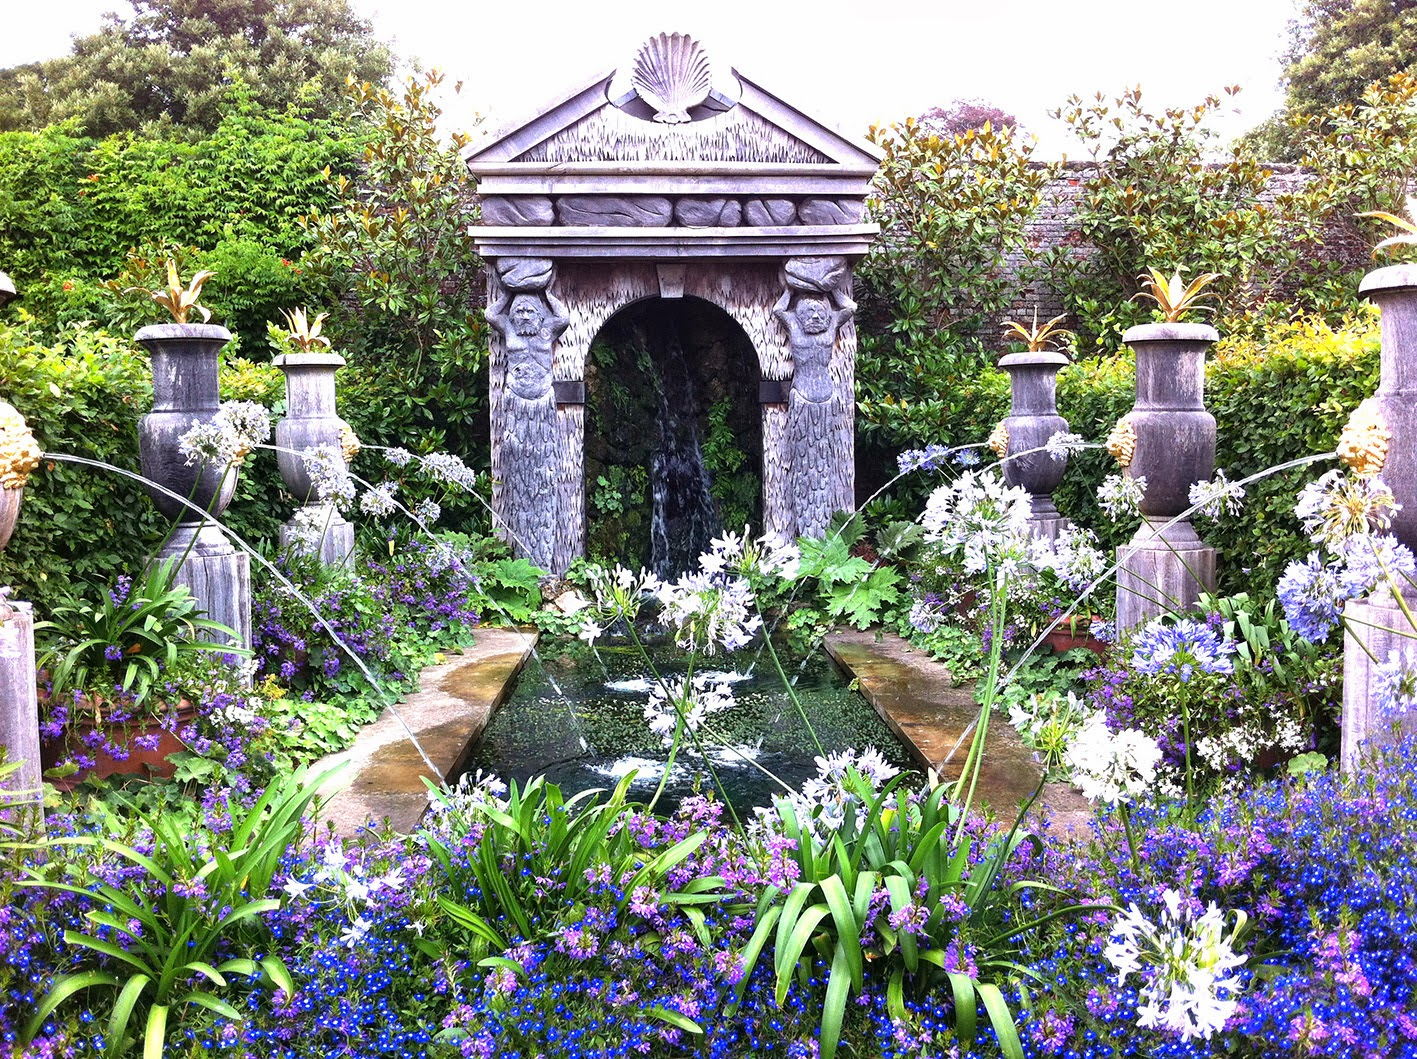 Sukie and friends: Arundel Castle gardens